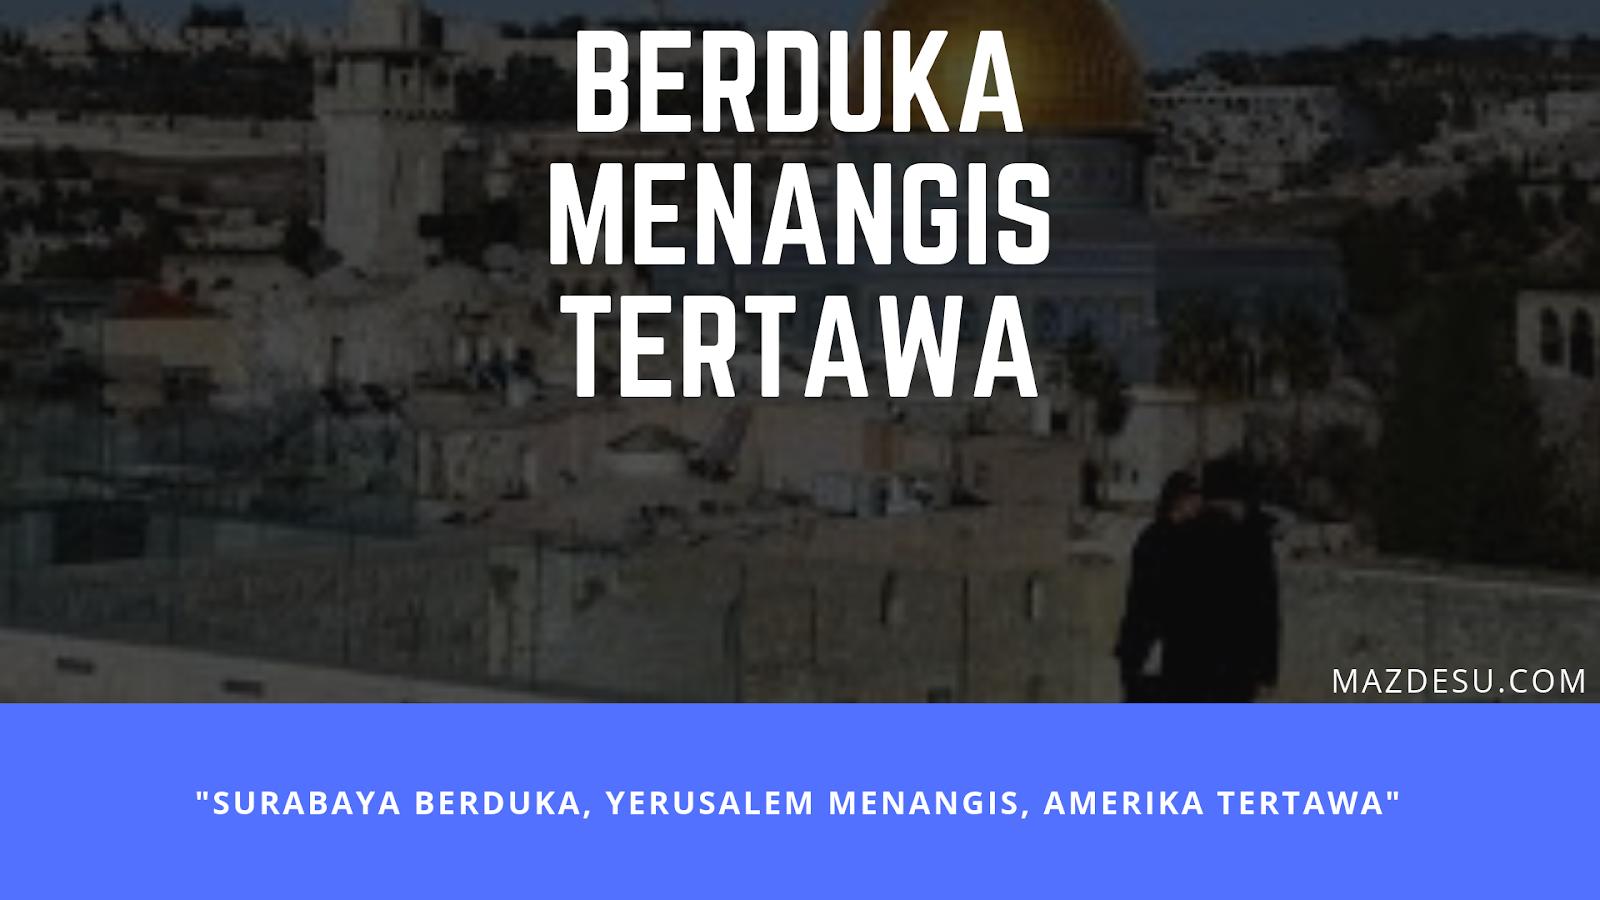 Surabaya Berduka, Yerusalem Menangis, Amerika Tertawa